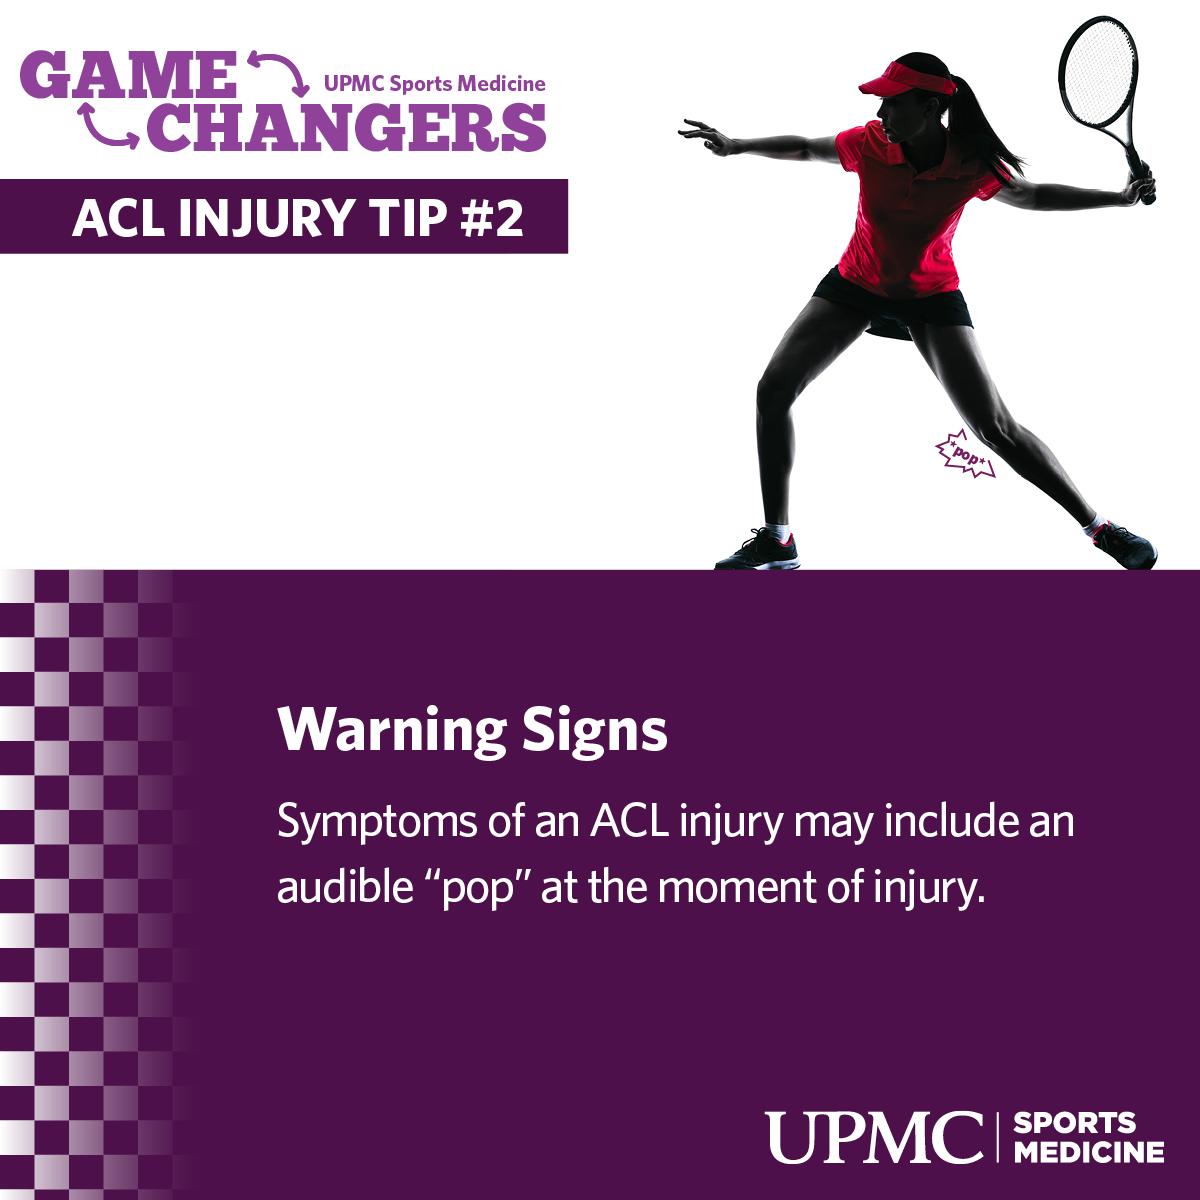 UPMC_GameChangers_ACL_FB2_FINAL